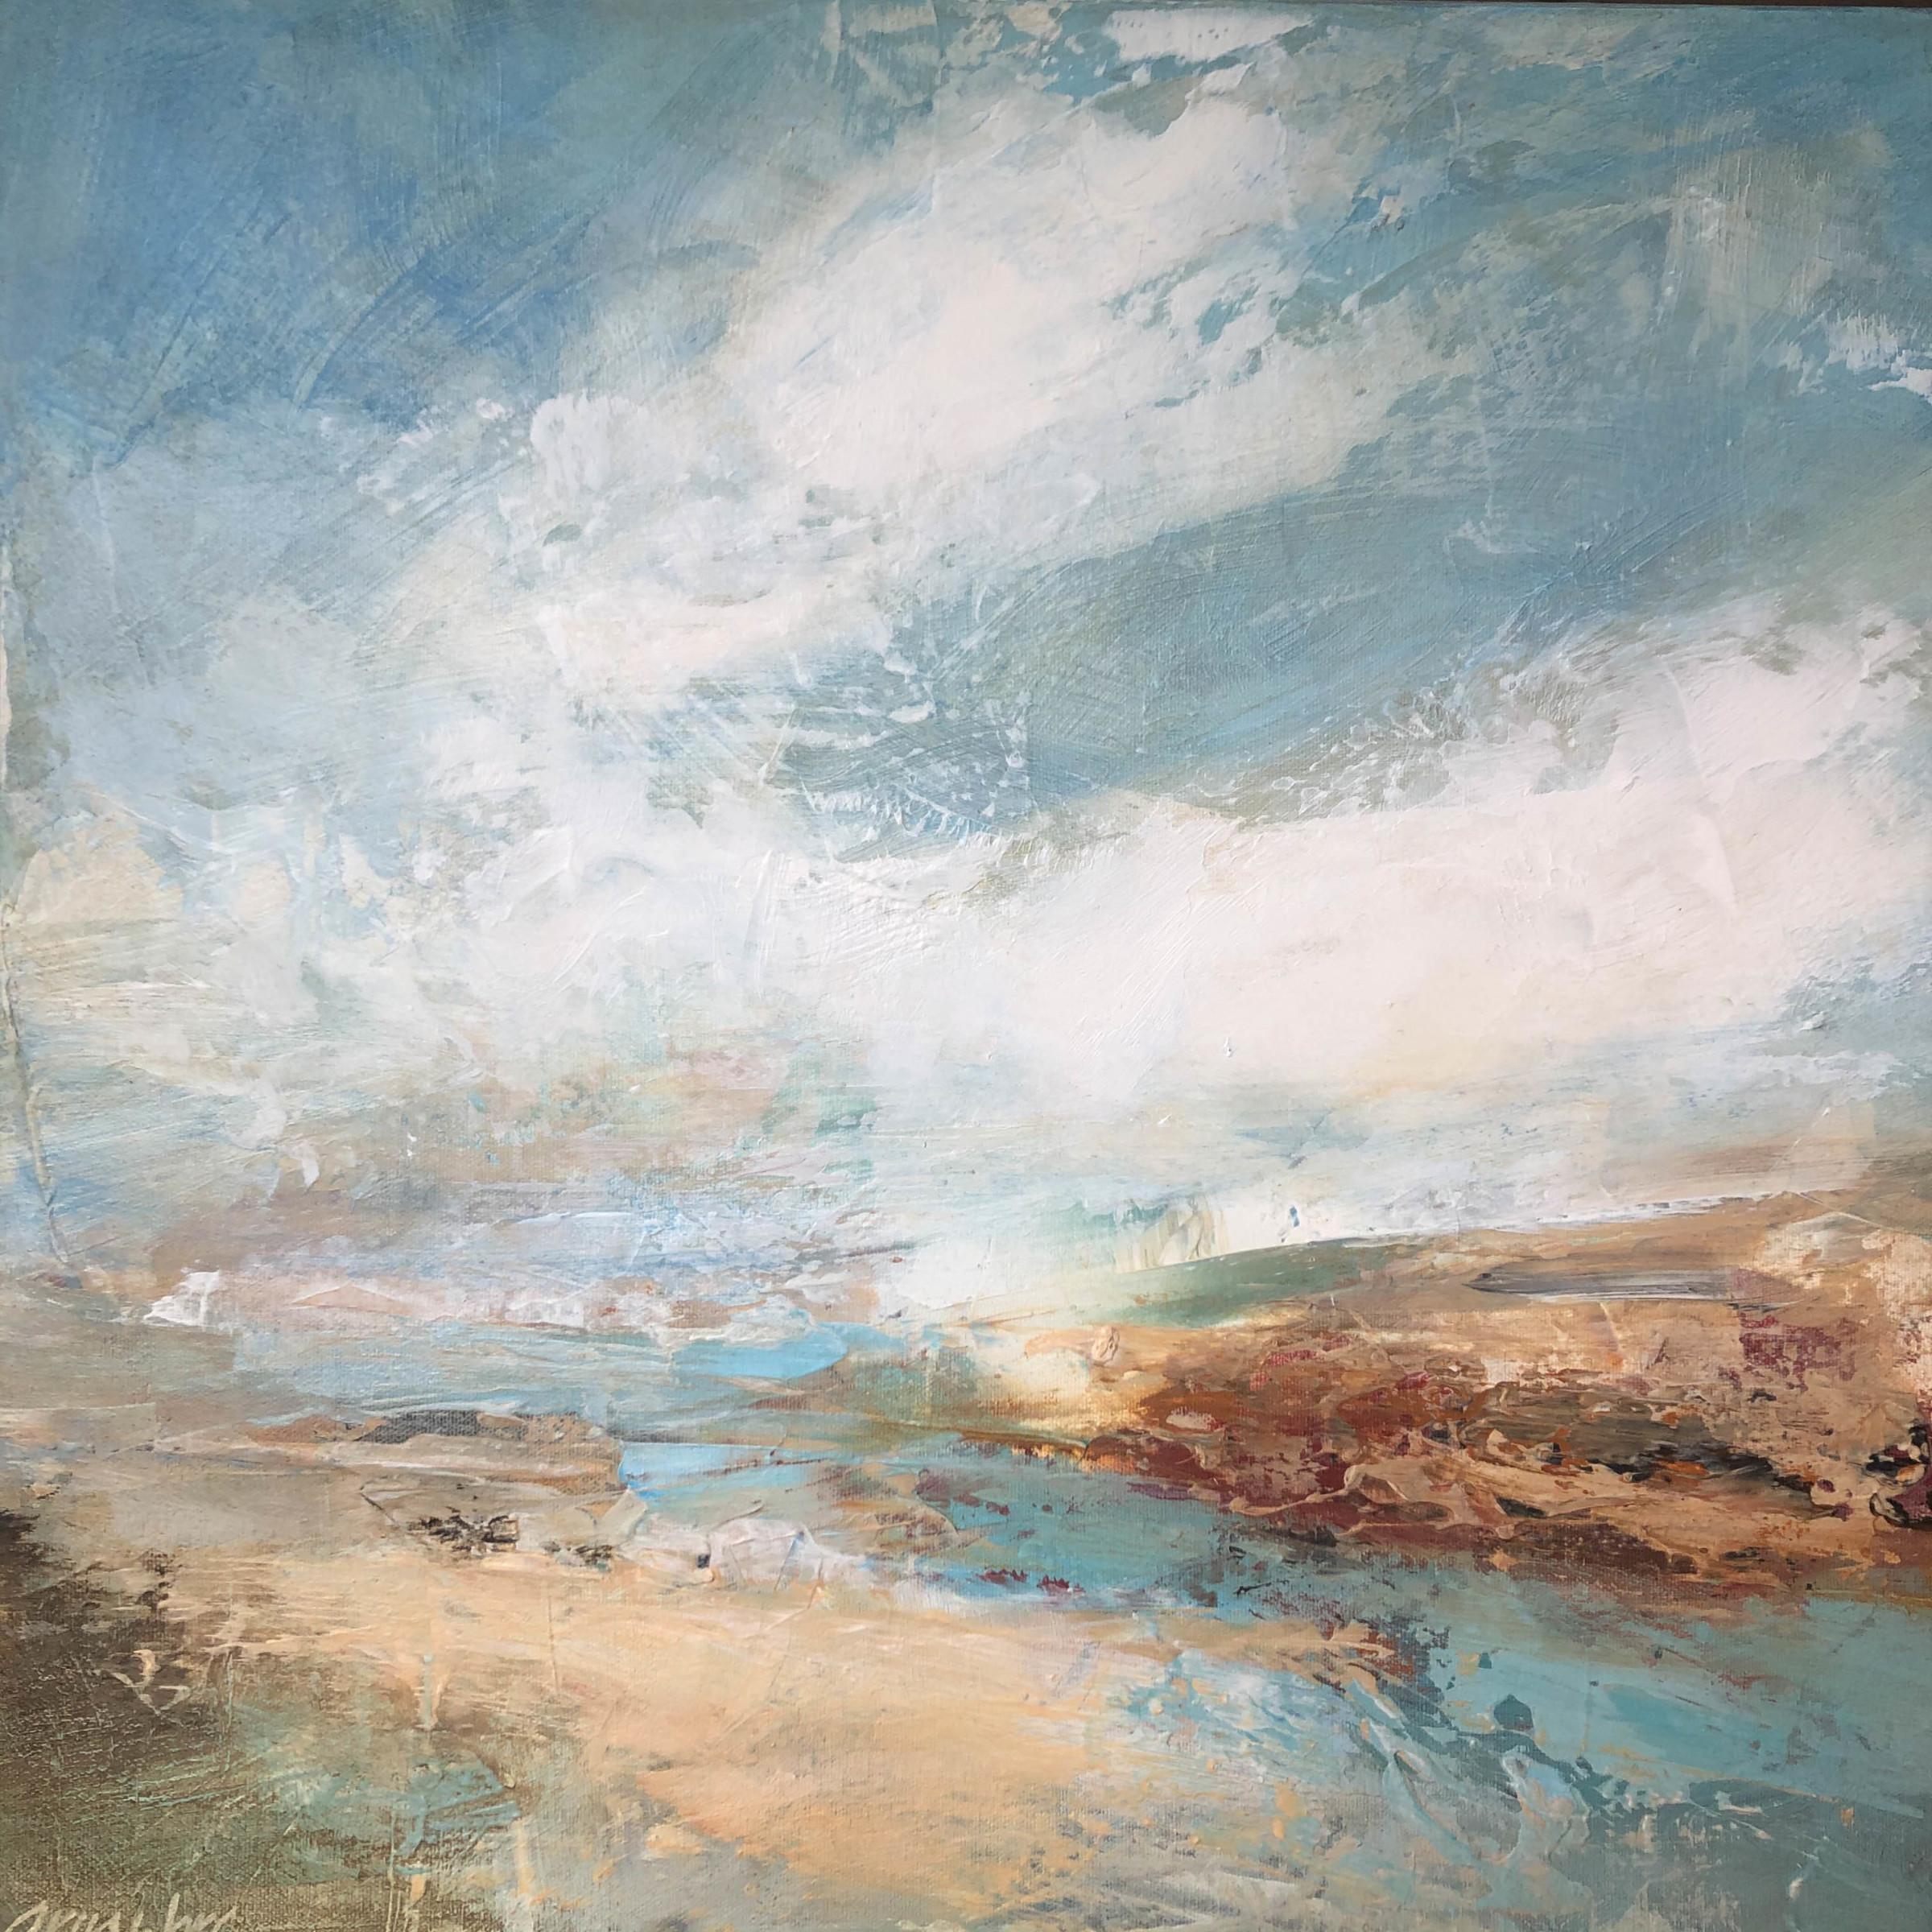 "<span class=""link fancybox-details-link""><a href=""/artists/41-erin-ward/works/7227-erin-ward-summer-sky-2020/"">View Detail Page</a></span><div class=""artist""><strong>Erin Ward</strong></div> b. 1966 <div class=""title""><em>Summer Sky </em>, 2020</div> <div class=""medium"">acrylic on canvas</div> <div class=""dimensions"">h. 52 cm x w. 52 cm</div><div class=""price"">£1,090.00</div><div class=""copyright_line"">Ownart: £109 x 10 Months, 0% APR</div>"